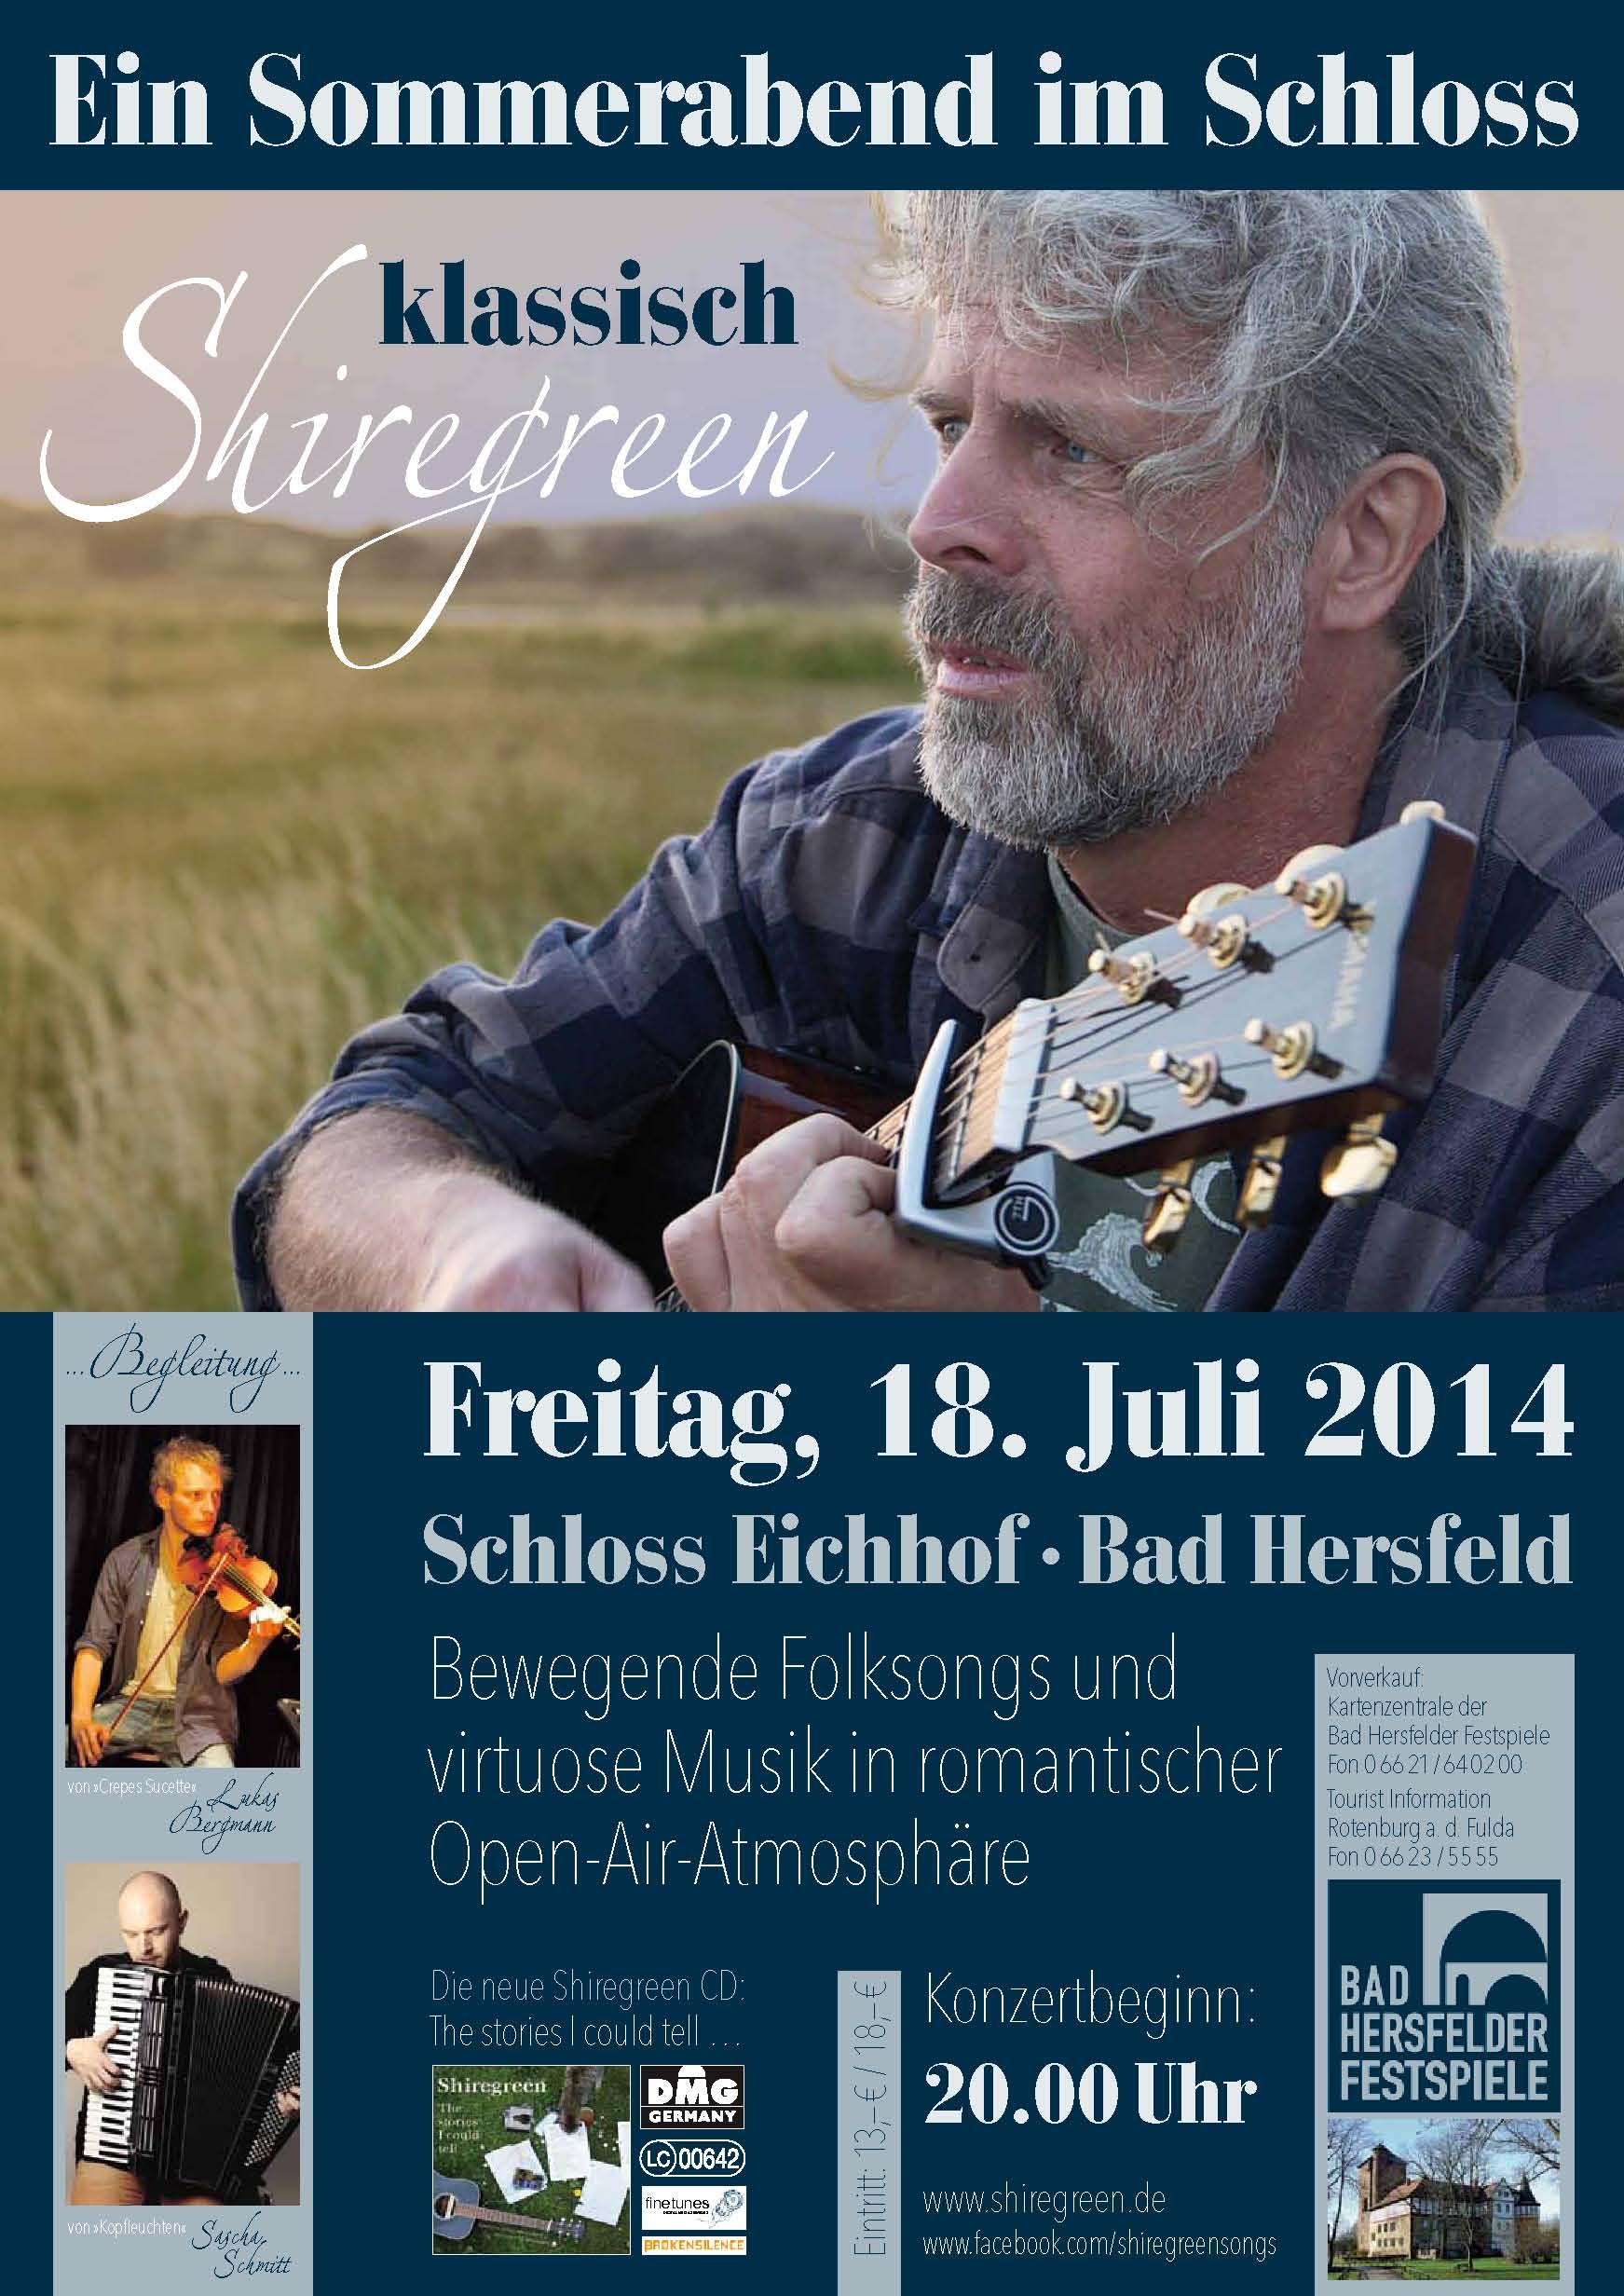 Plakat_Shiregreen_Eichhof_2014